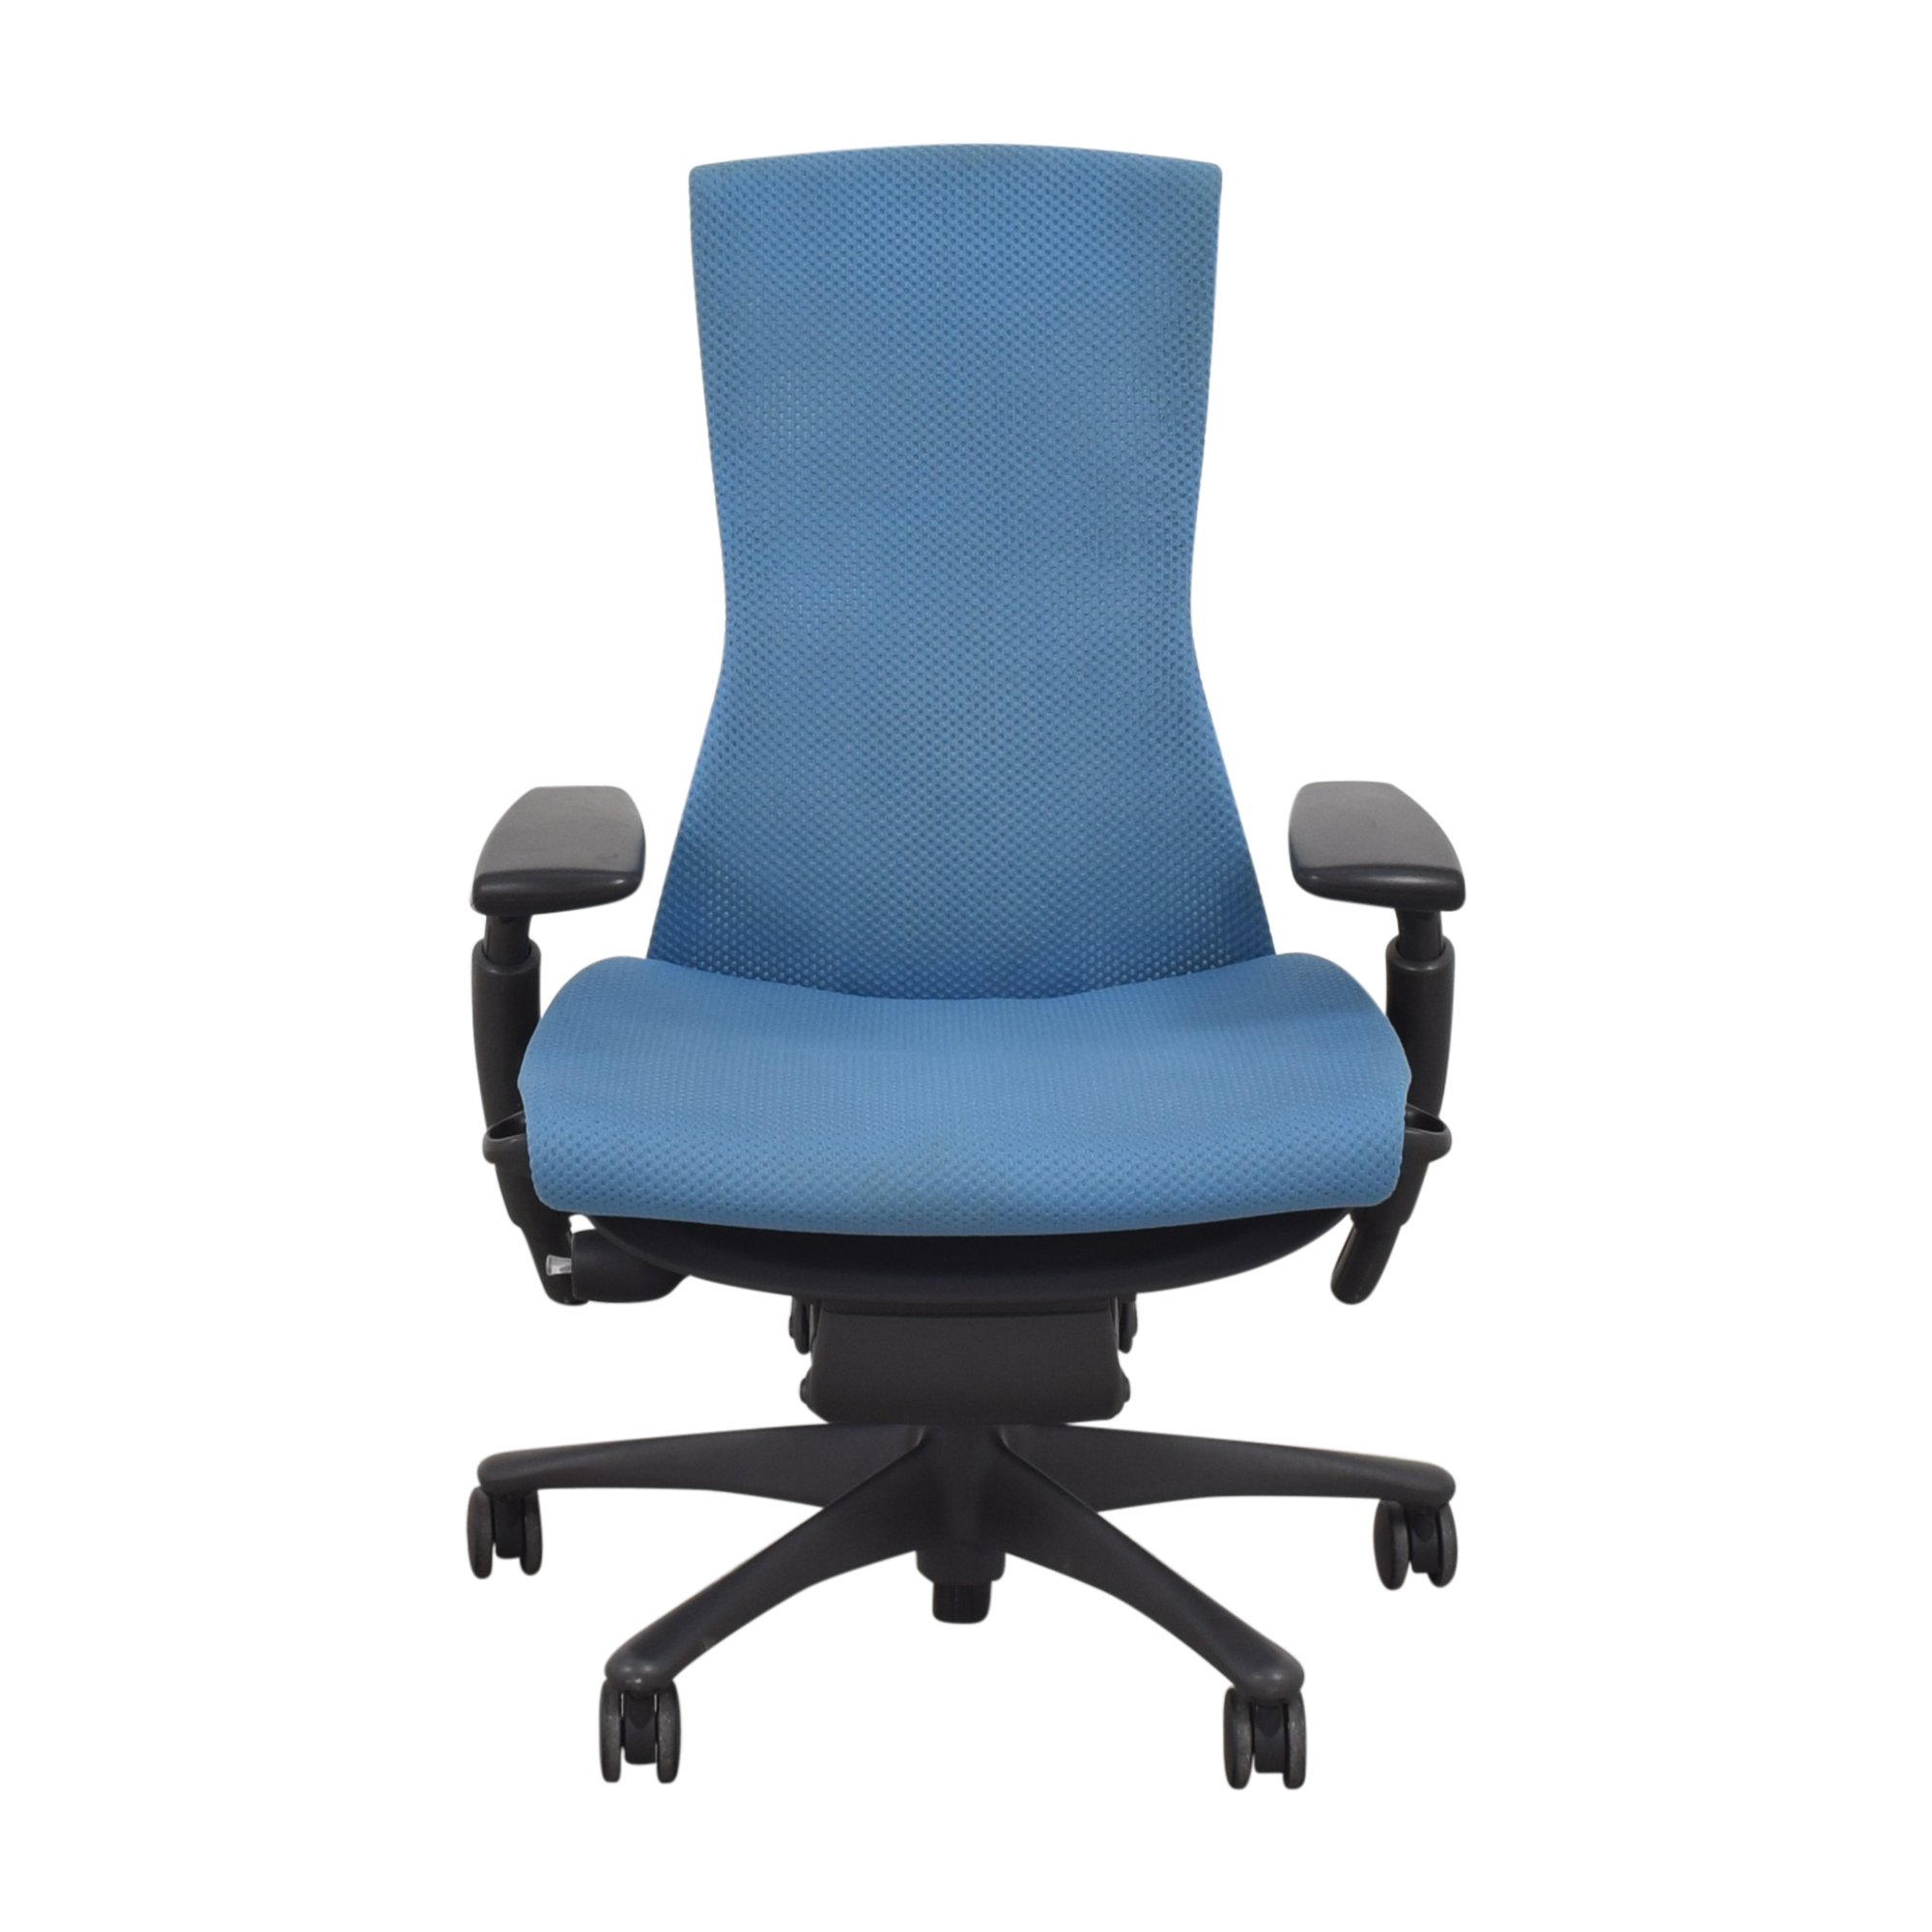 shop Herman Miller Herman Miller Embody Chair online